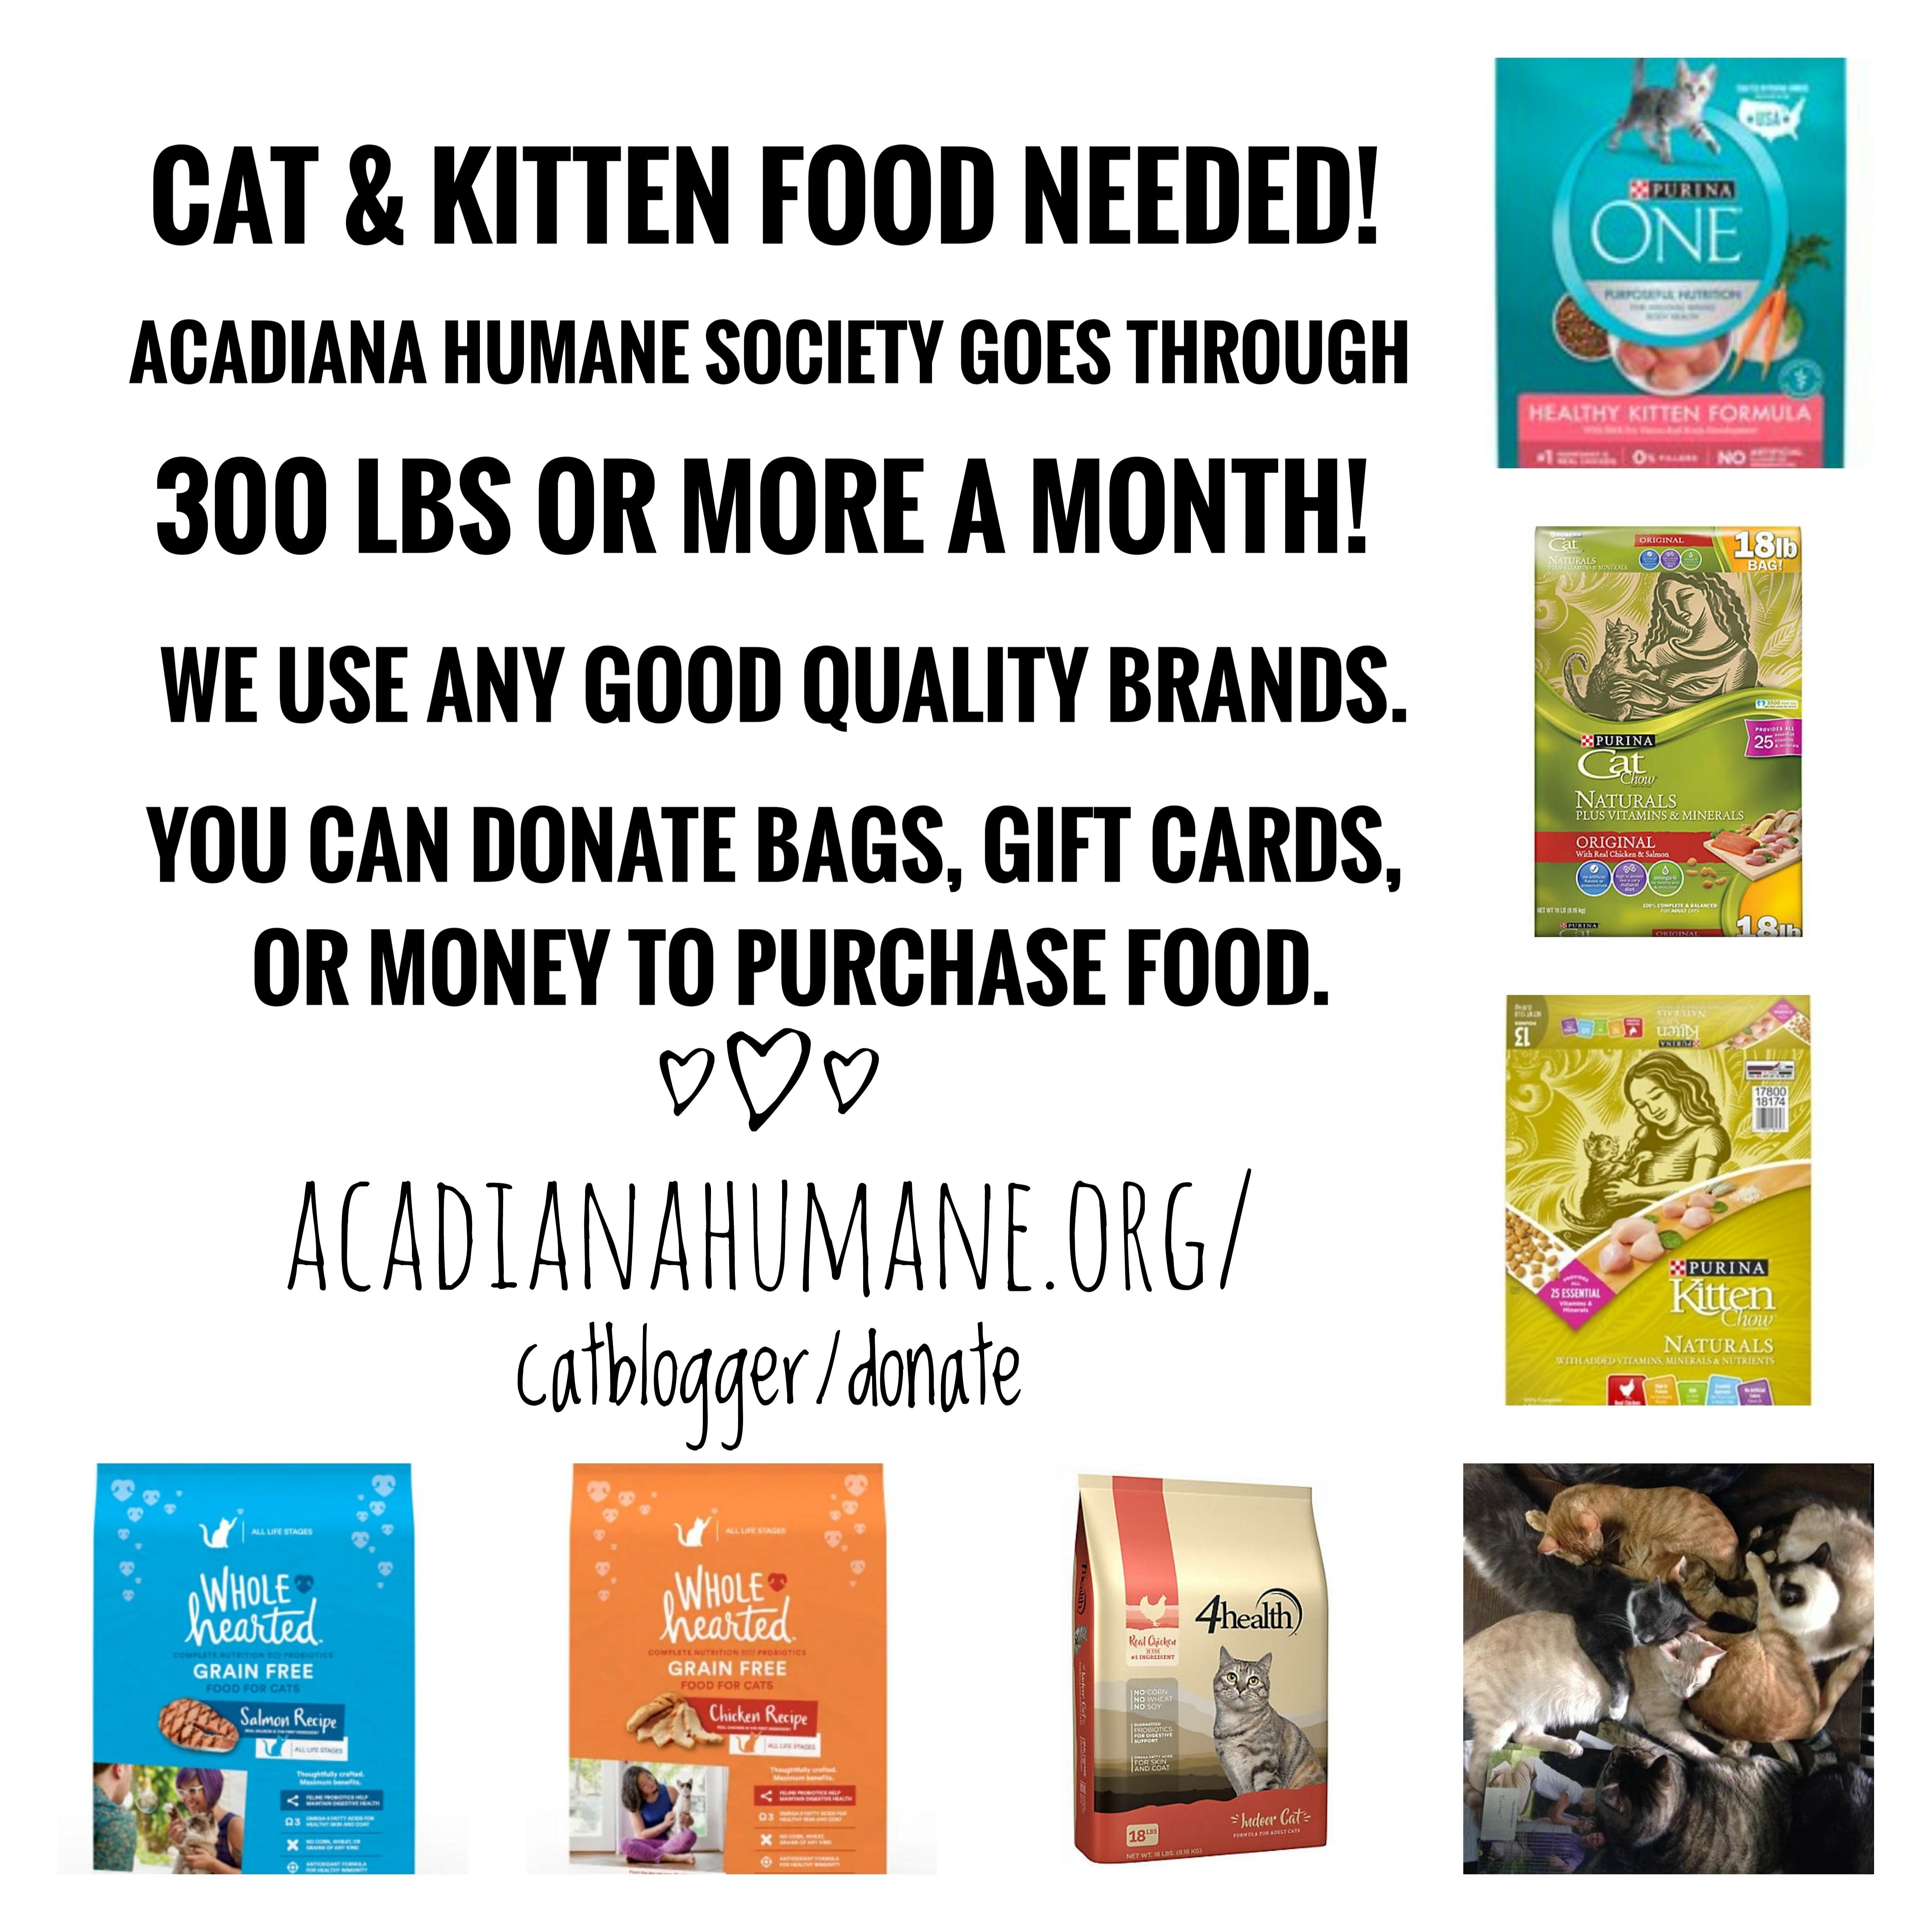 We need cat food please!